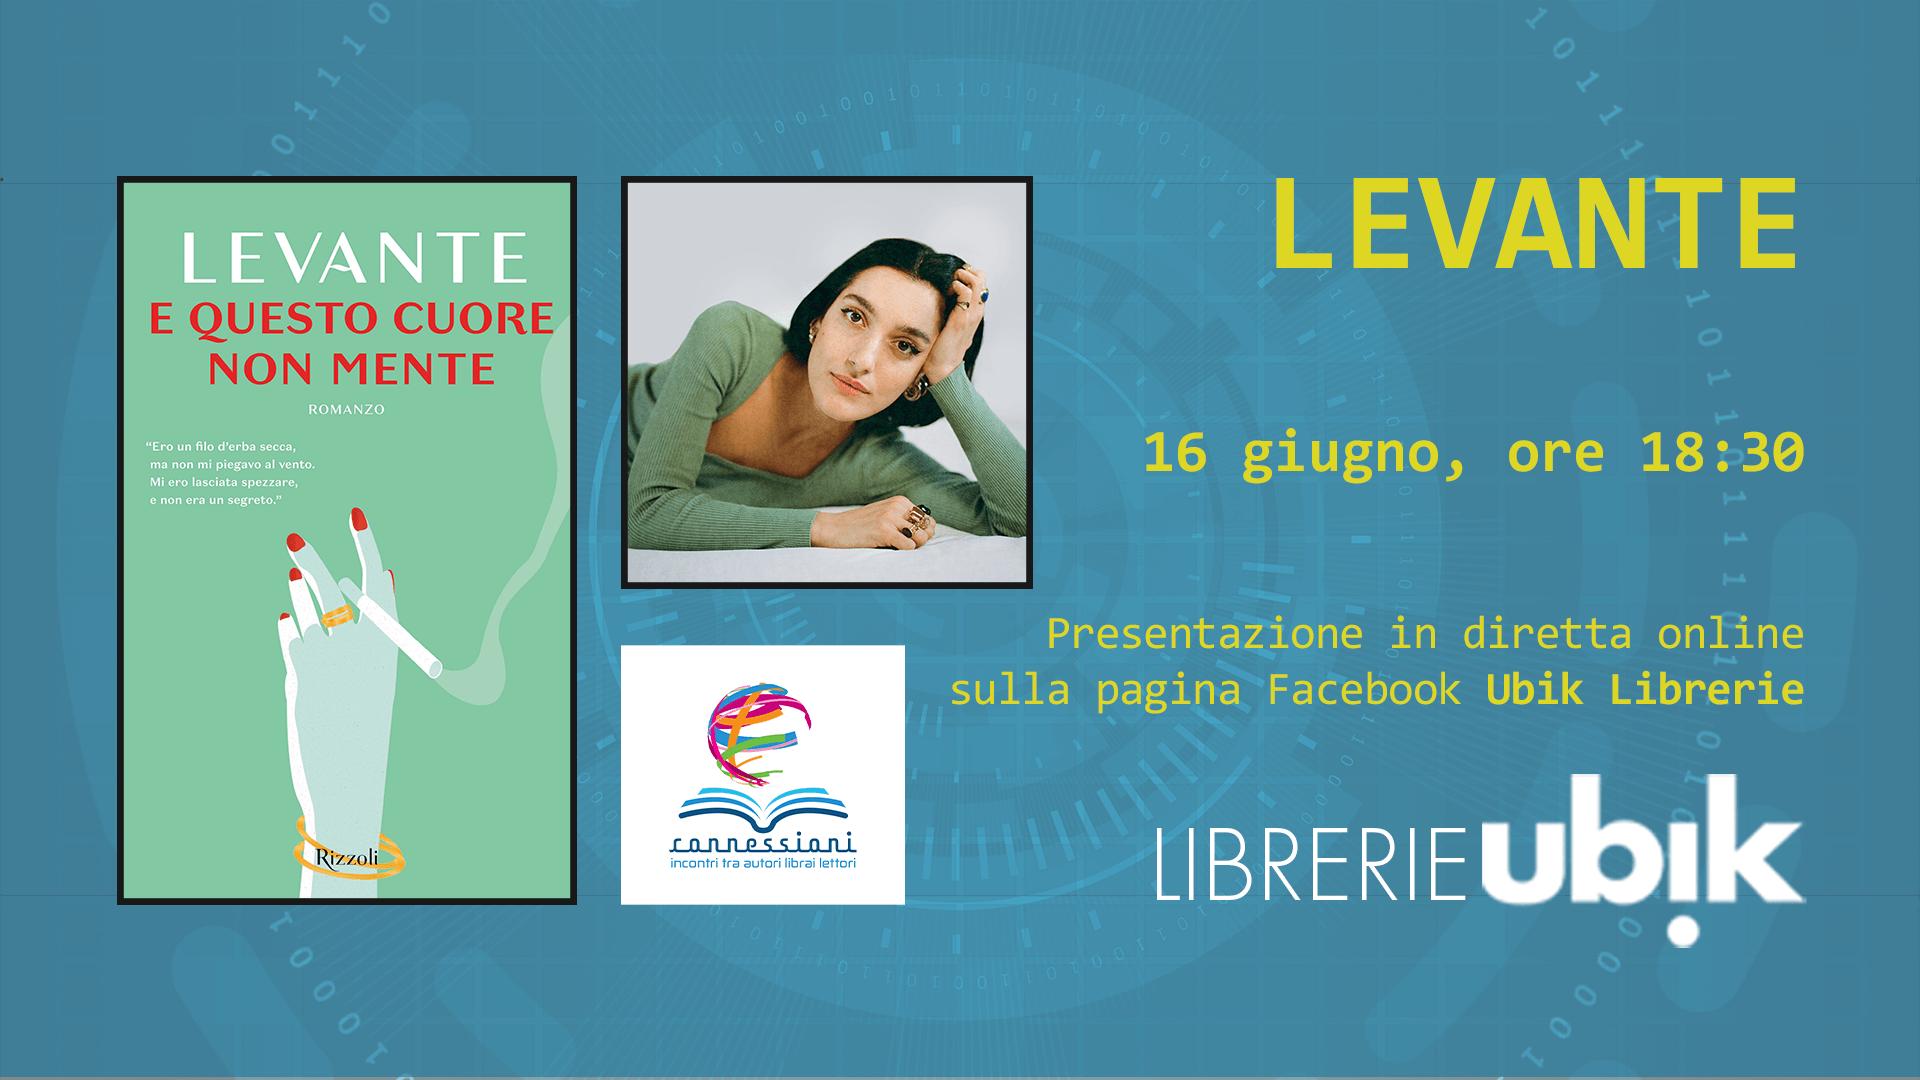 LEVANTE presenta